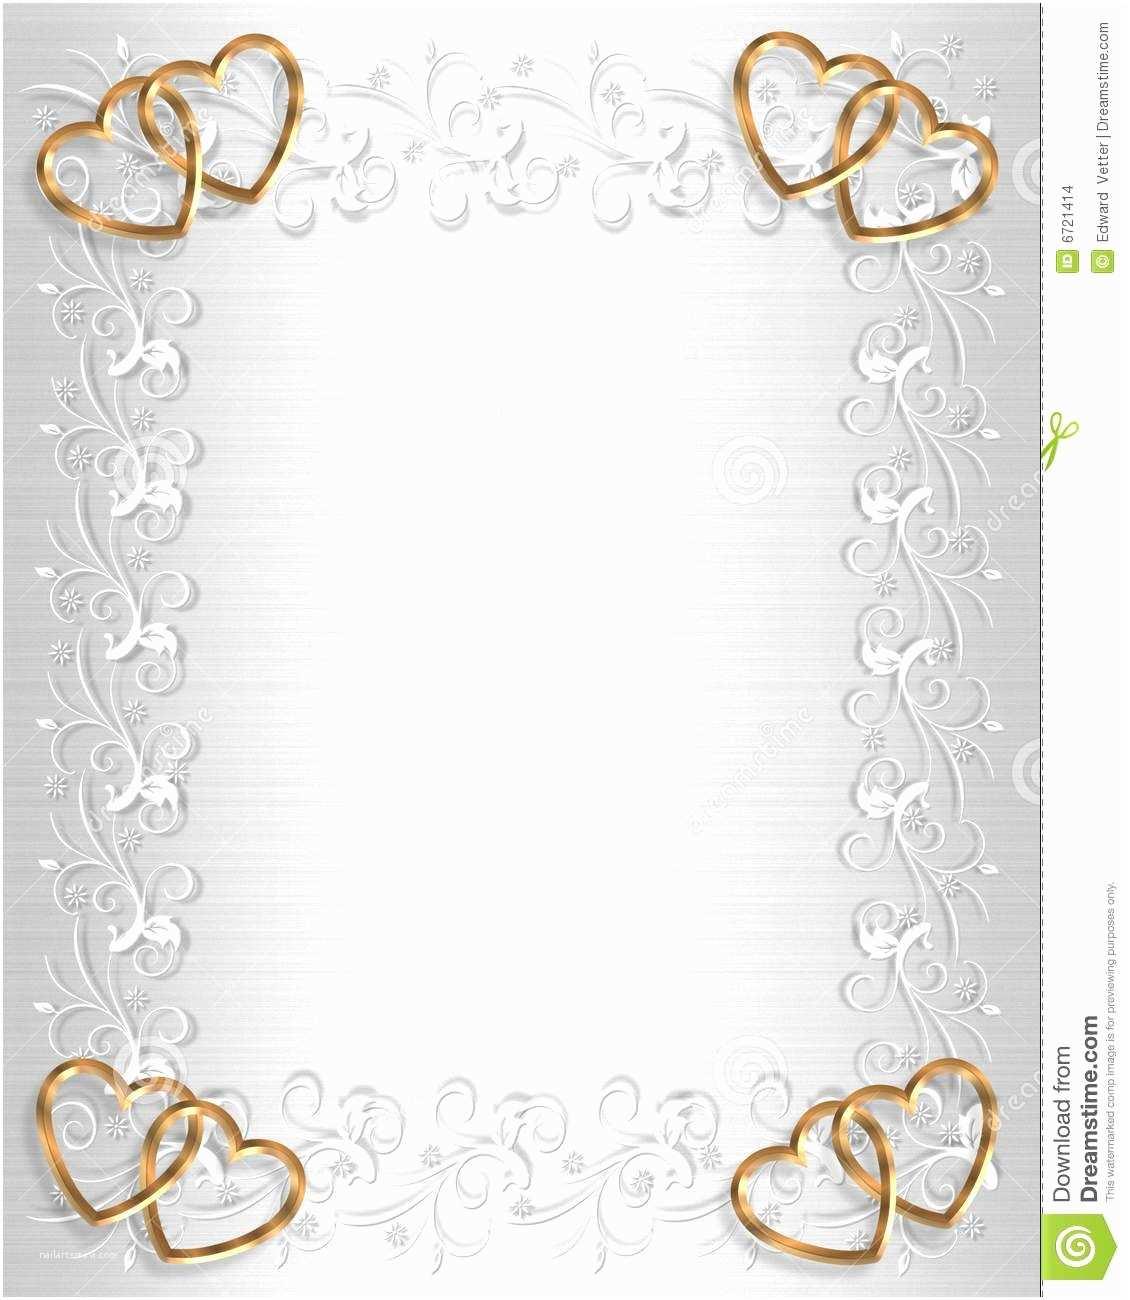 Background Images for Wedding Invitation Cards Angel Border Stationaray